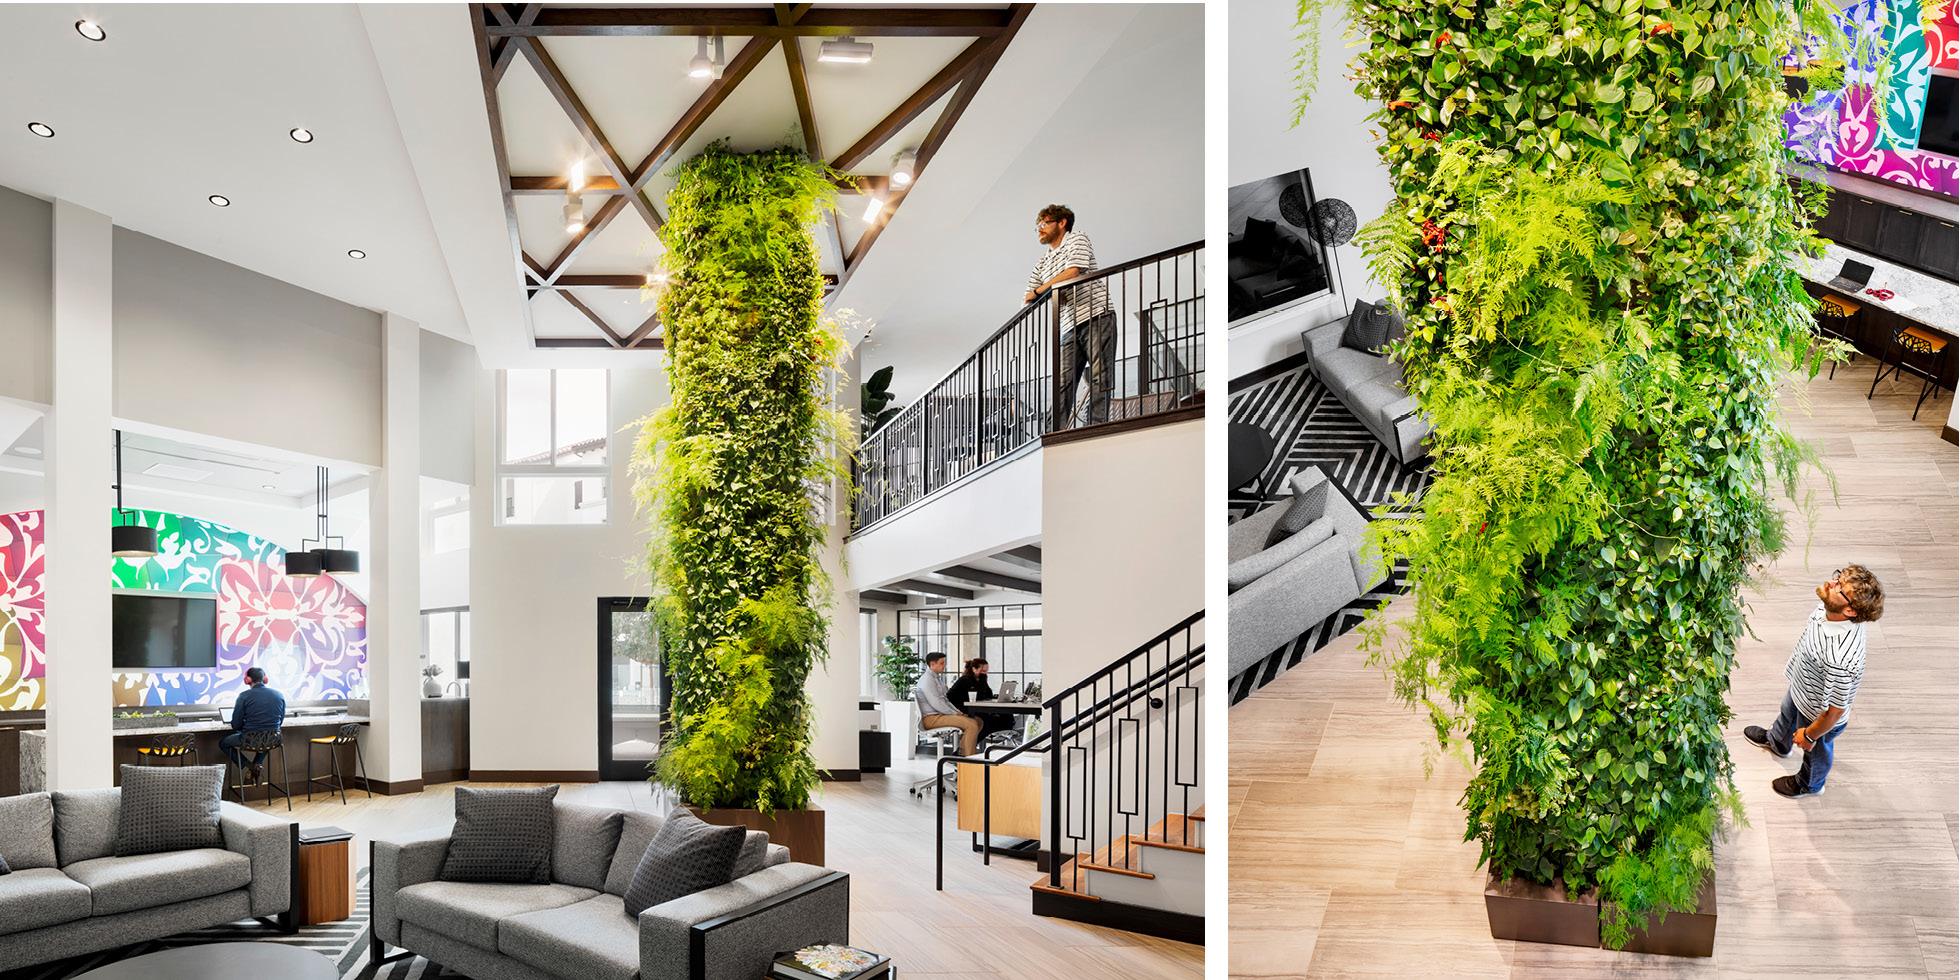 Encasa  Living Wall by Habitat Horticulture - View 1